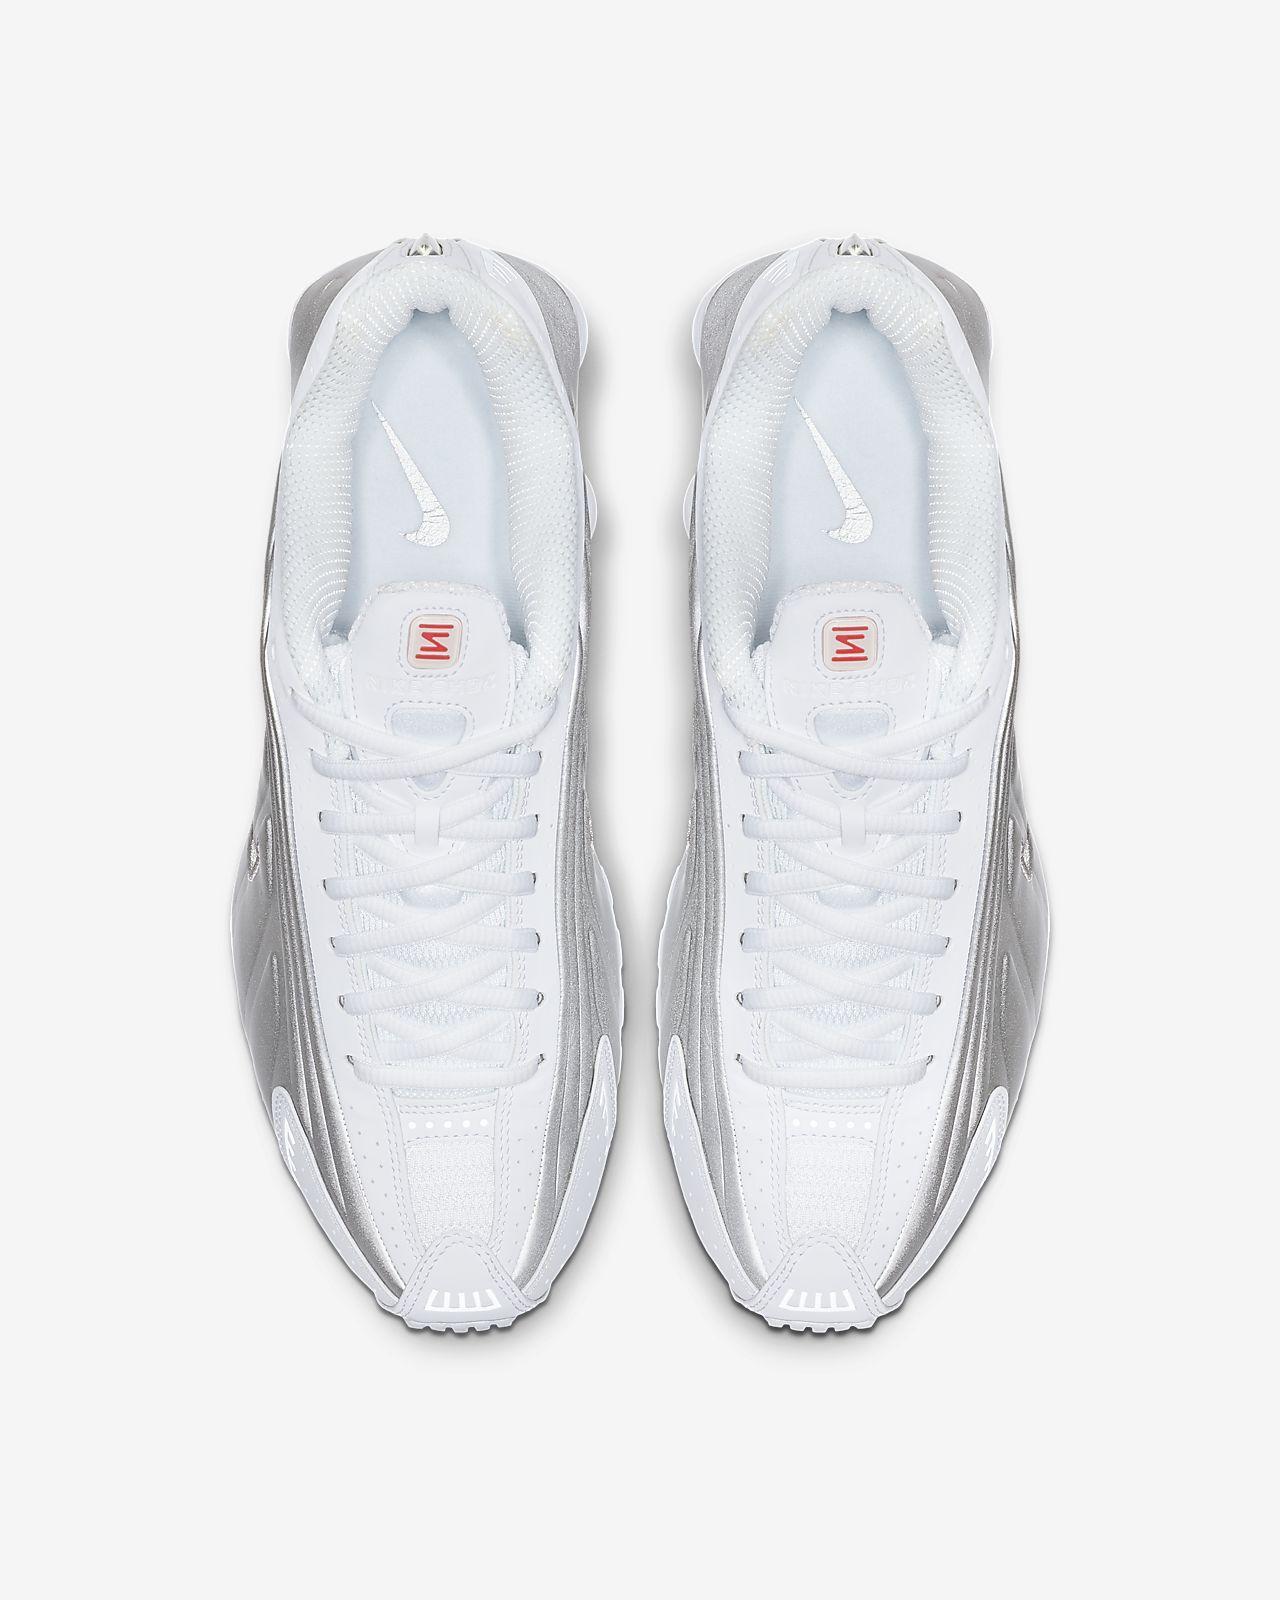 nike shox r4 chaussure pour homme